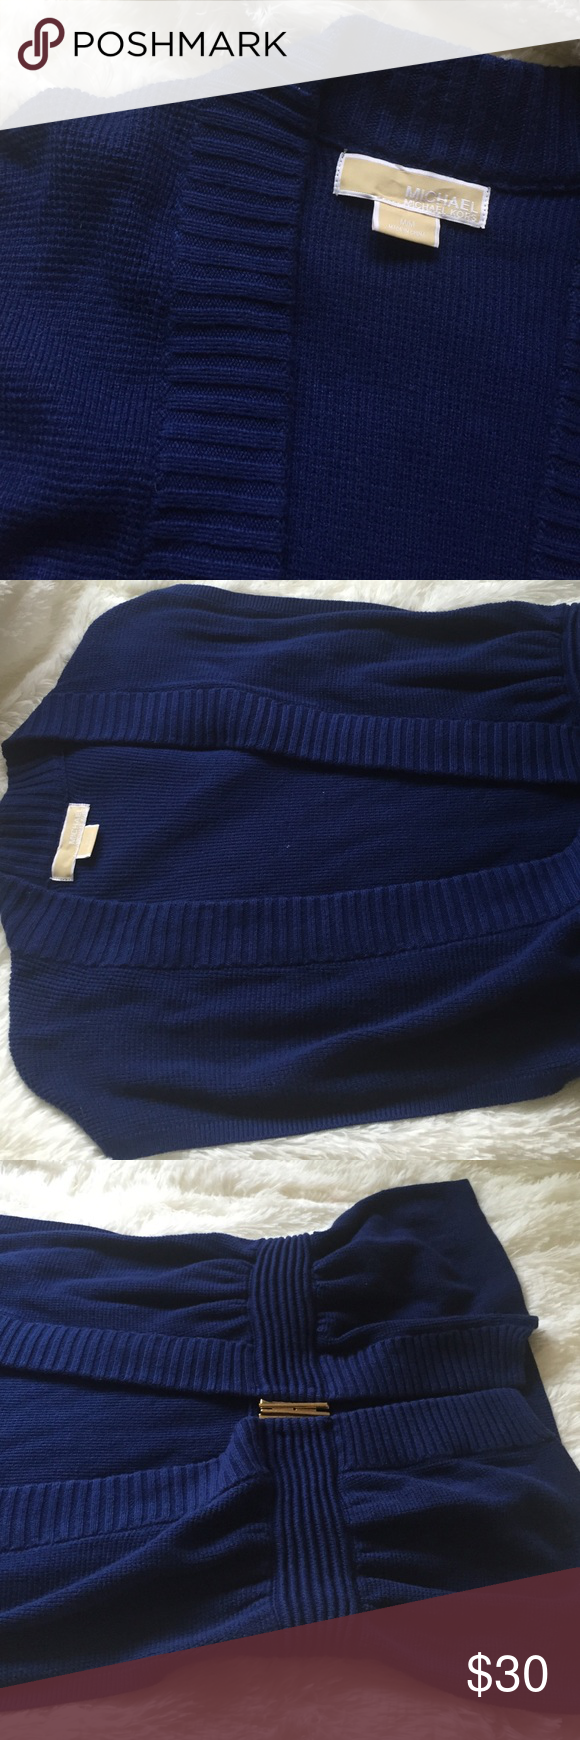 Michael kors vest Size medium no stains holes piling or snags KORS Michael Kors Jackets & Coats Vests